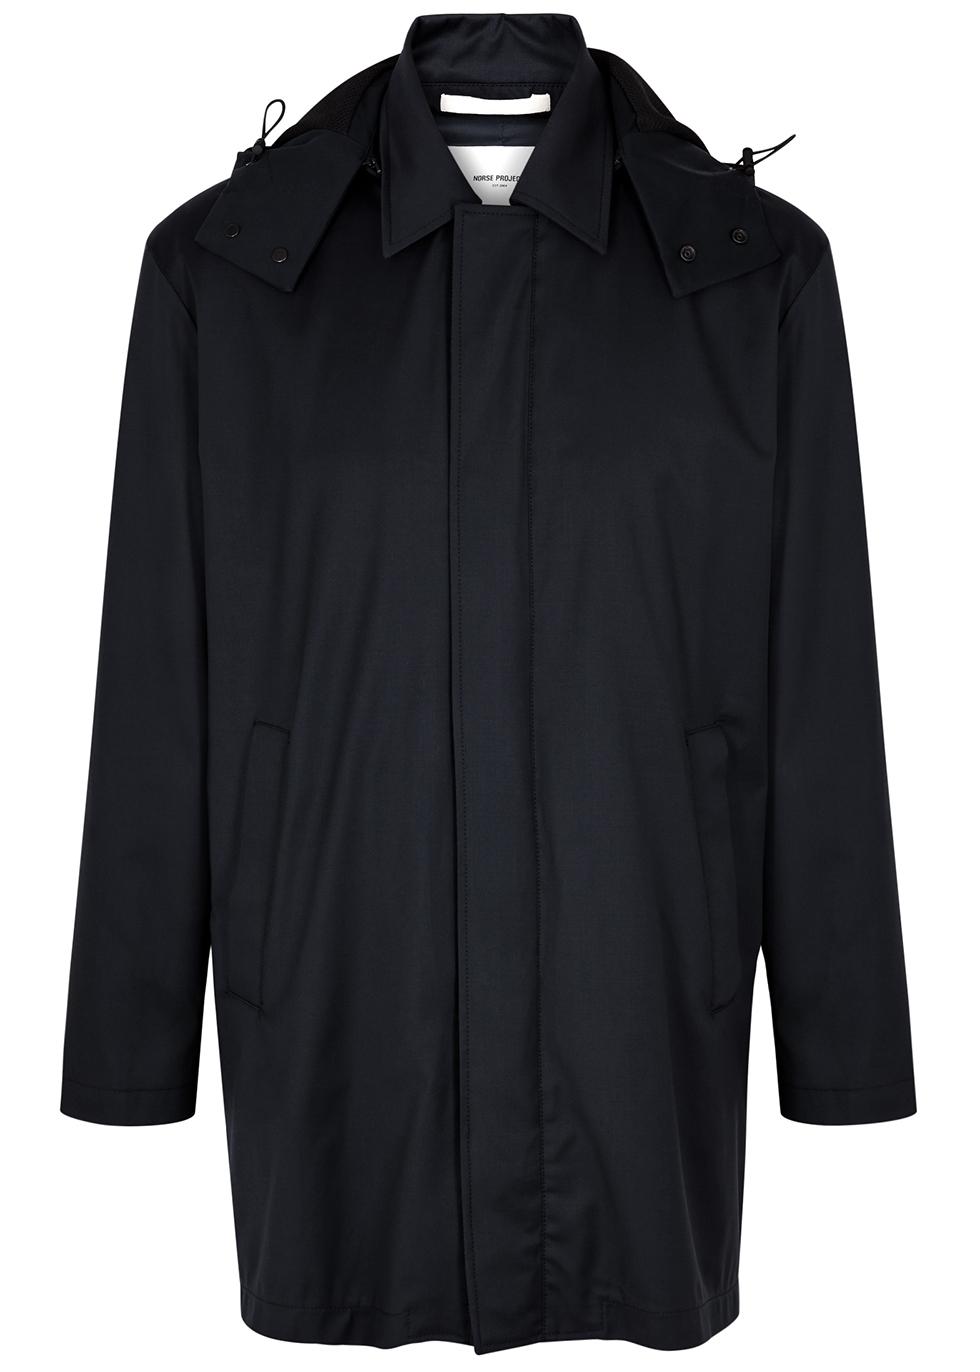 0e3fe6cf163 Norse Projects - Luxury Shirts & Trousers - Harvey Nichols